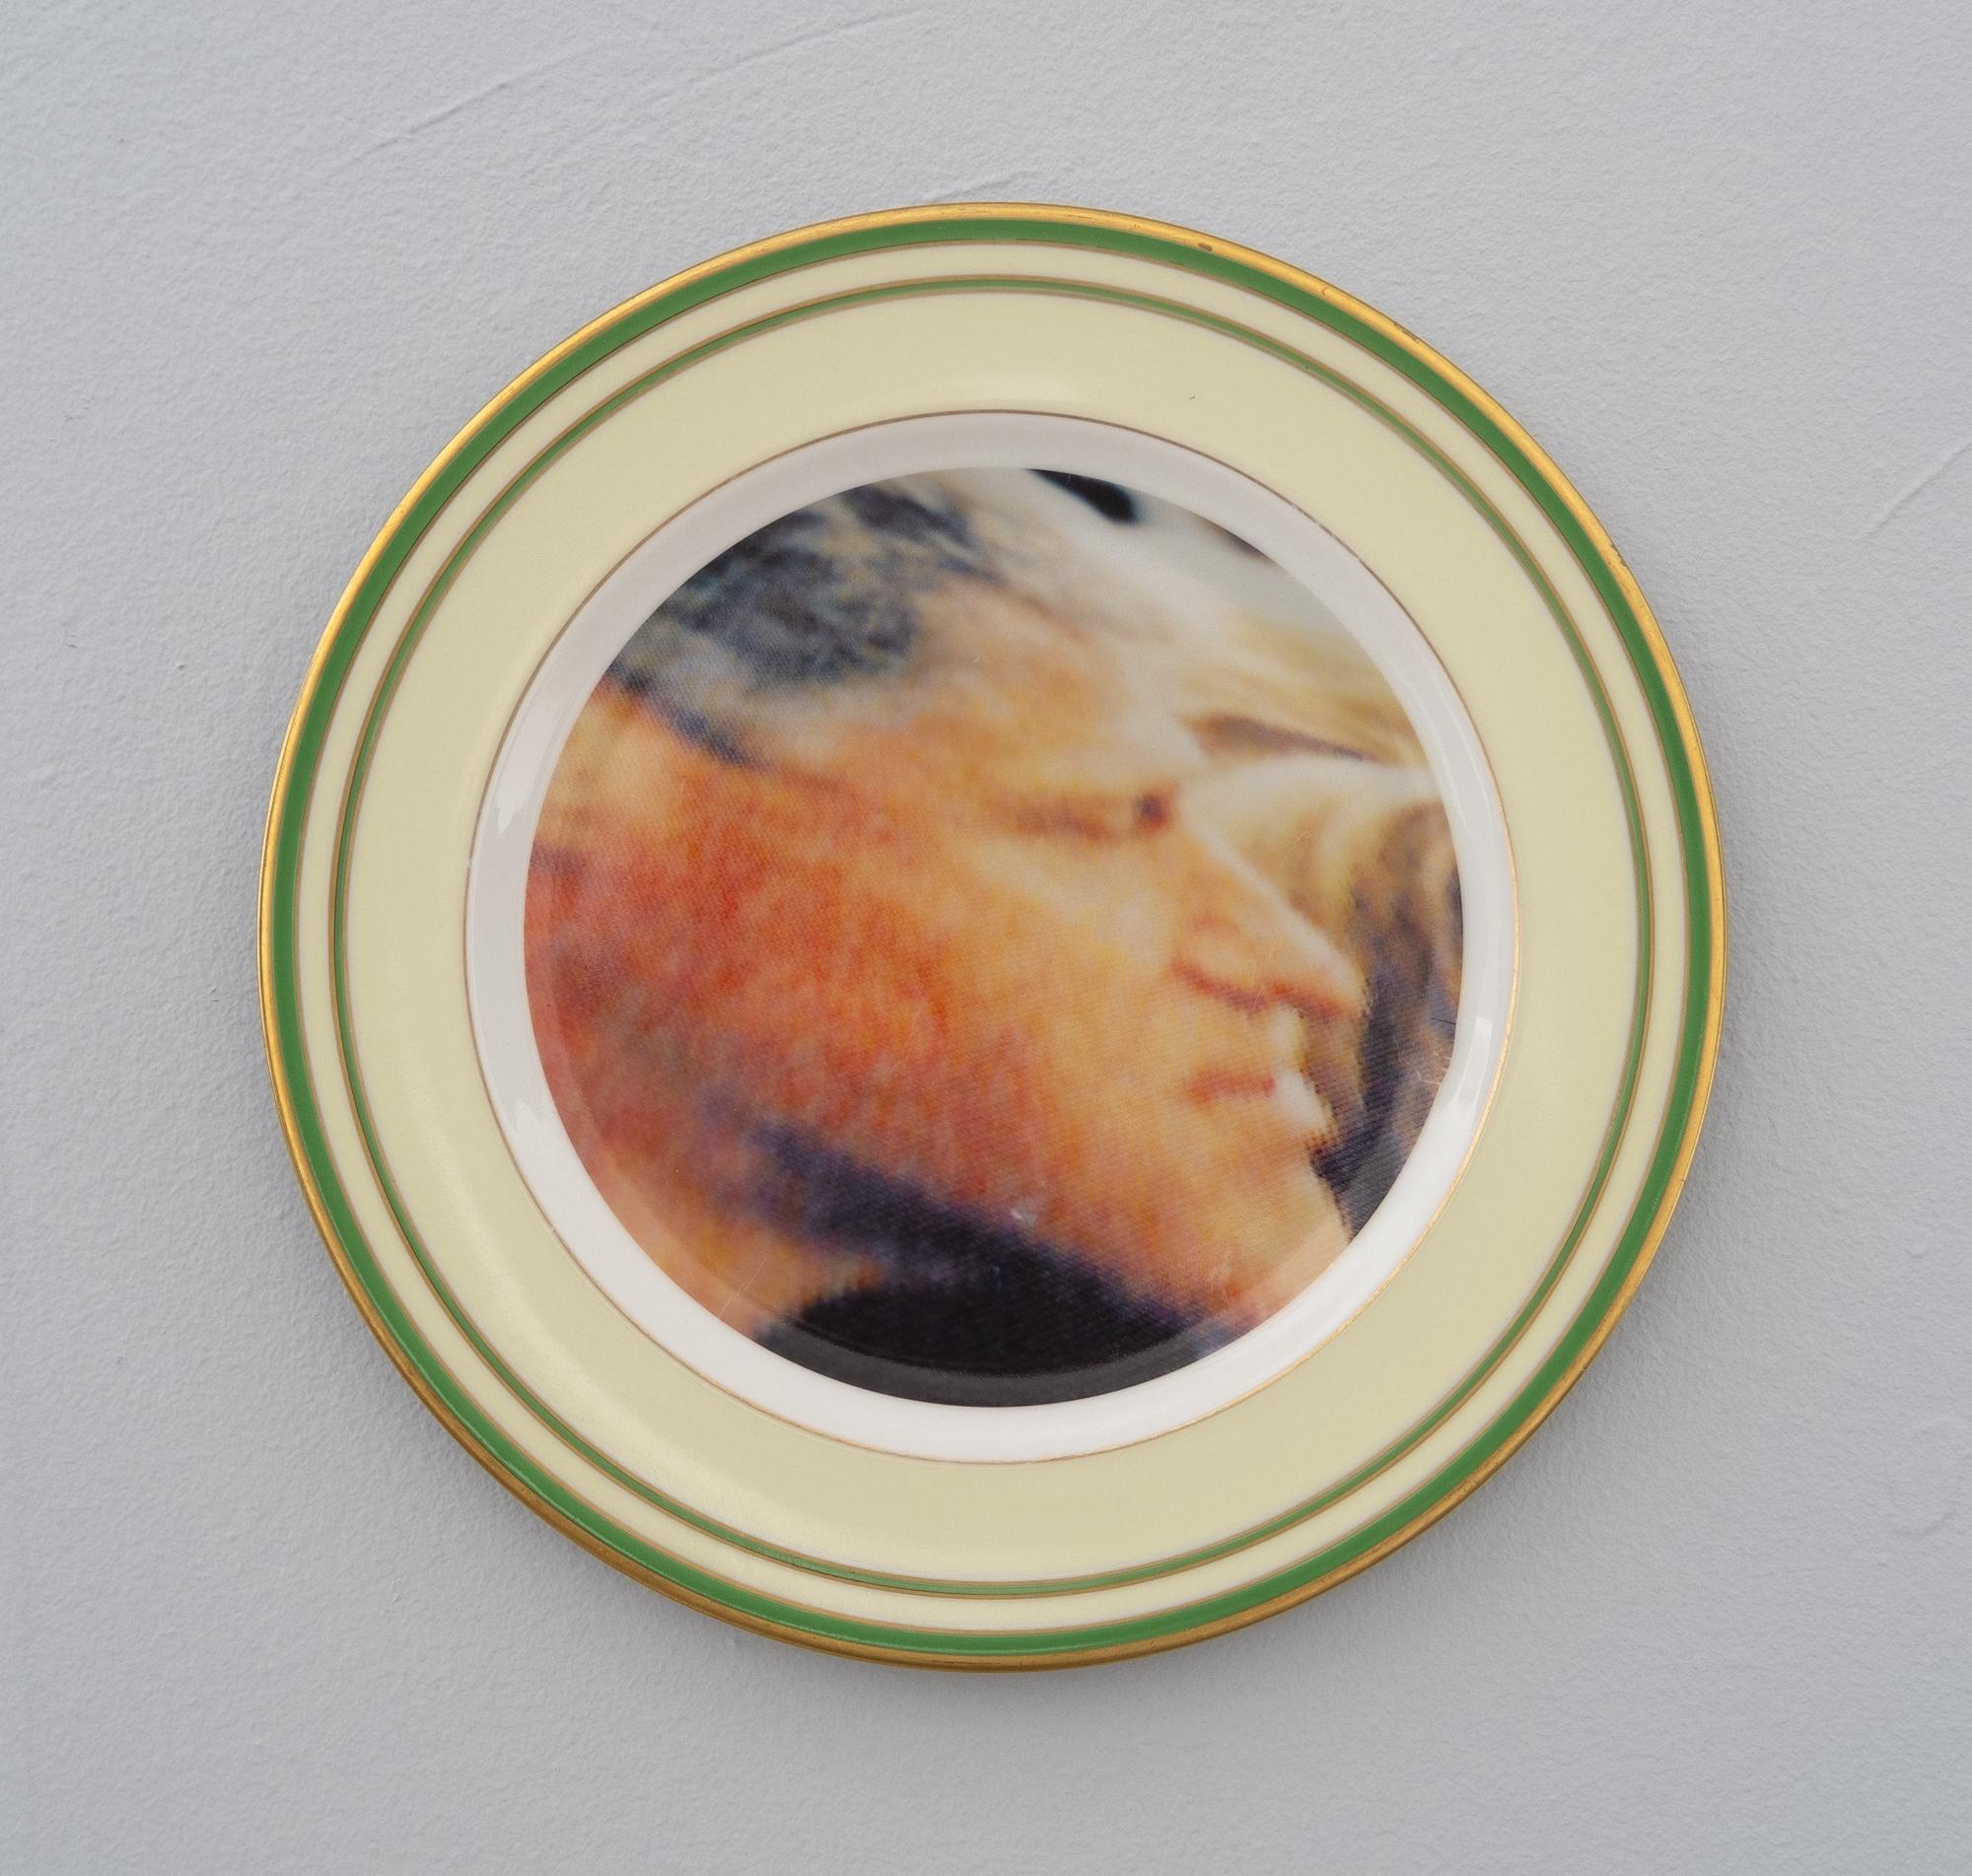 Bean Gilsdorf,  Bill Clinton , 2018, Ceramic plate, 10 inch diameter